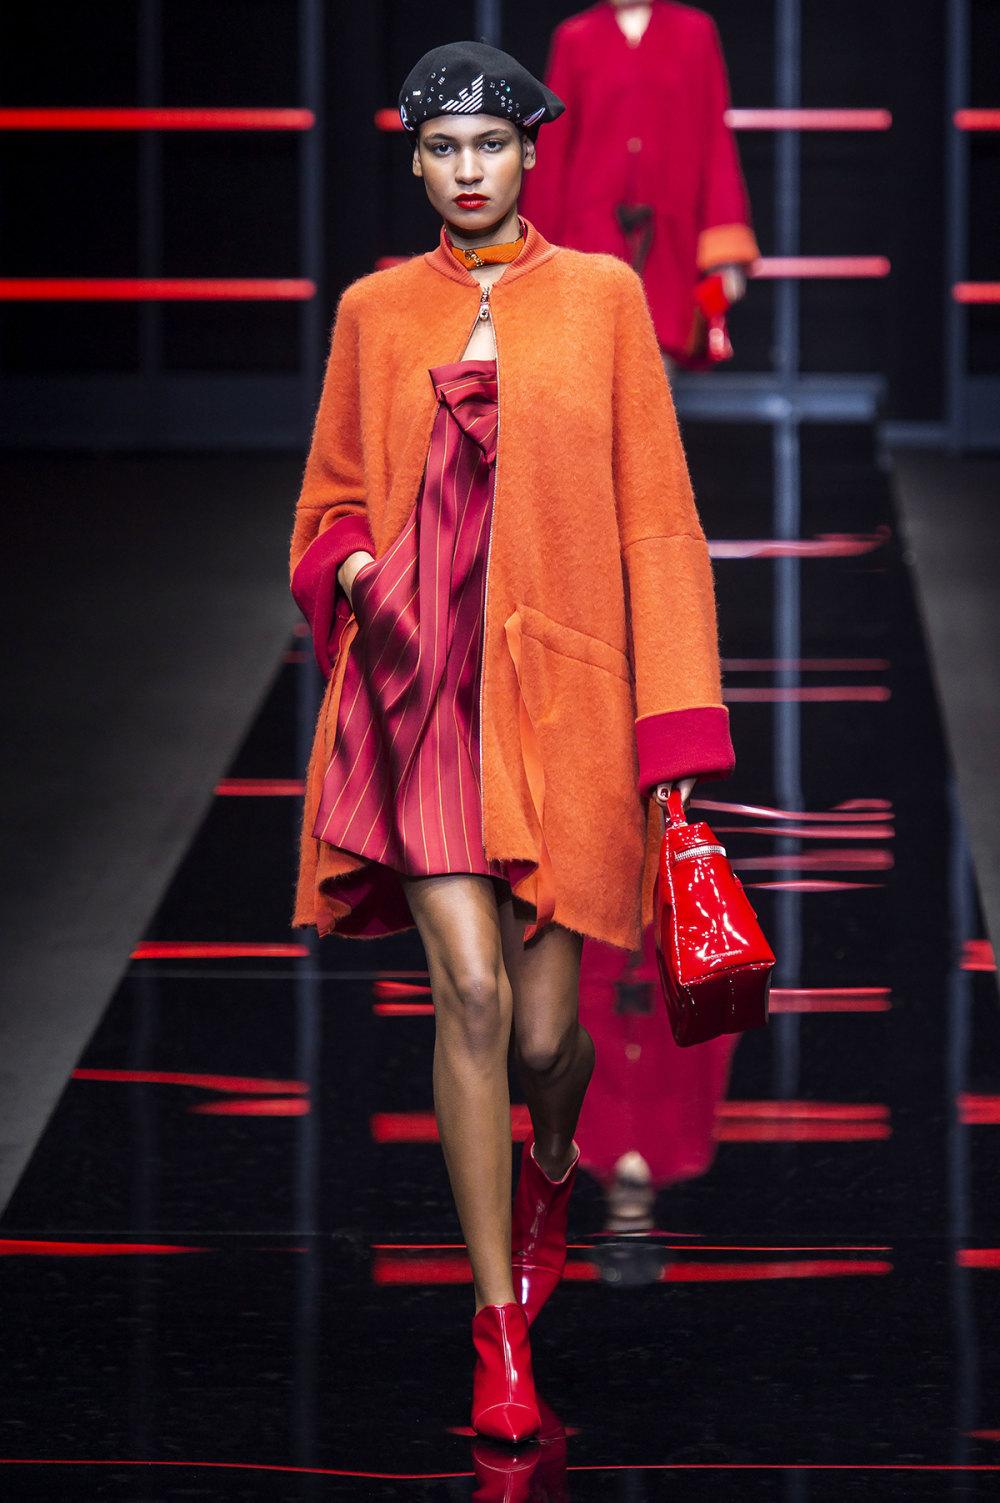 Emporio Armani时装系列畅的裤子带有柔滑裙子的鸡尾酒礼服-7.jpg